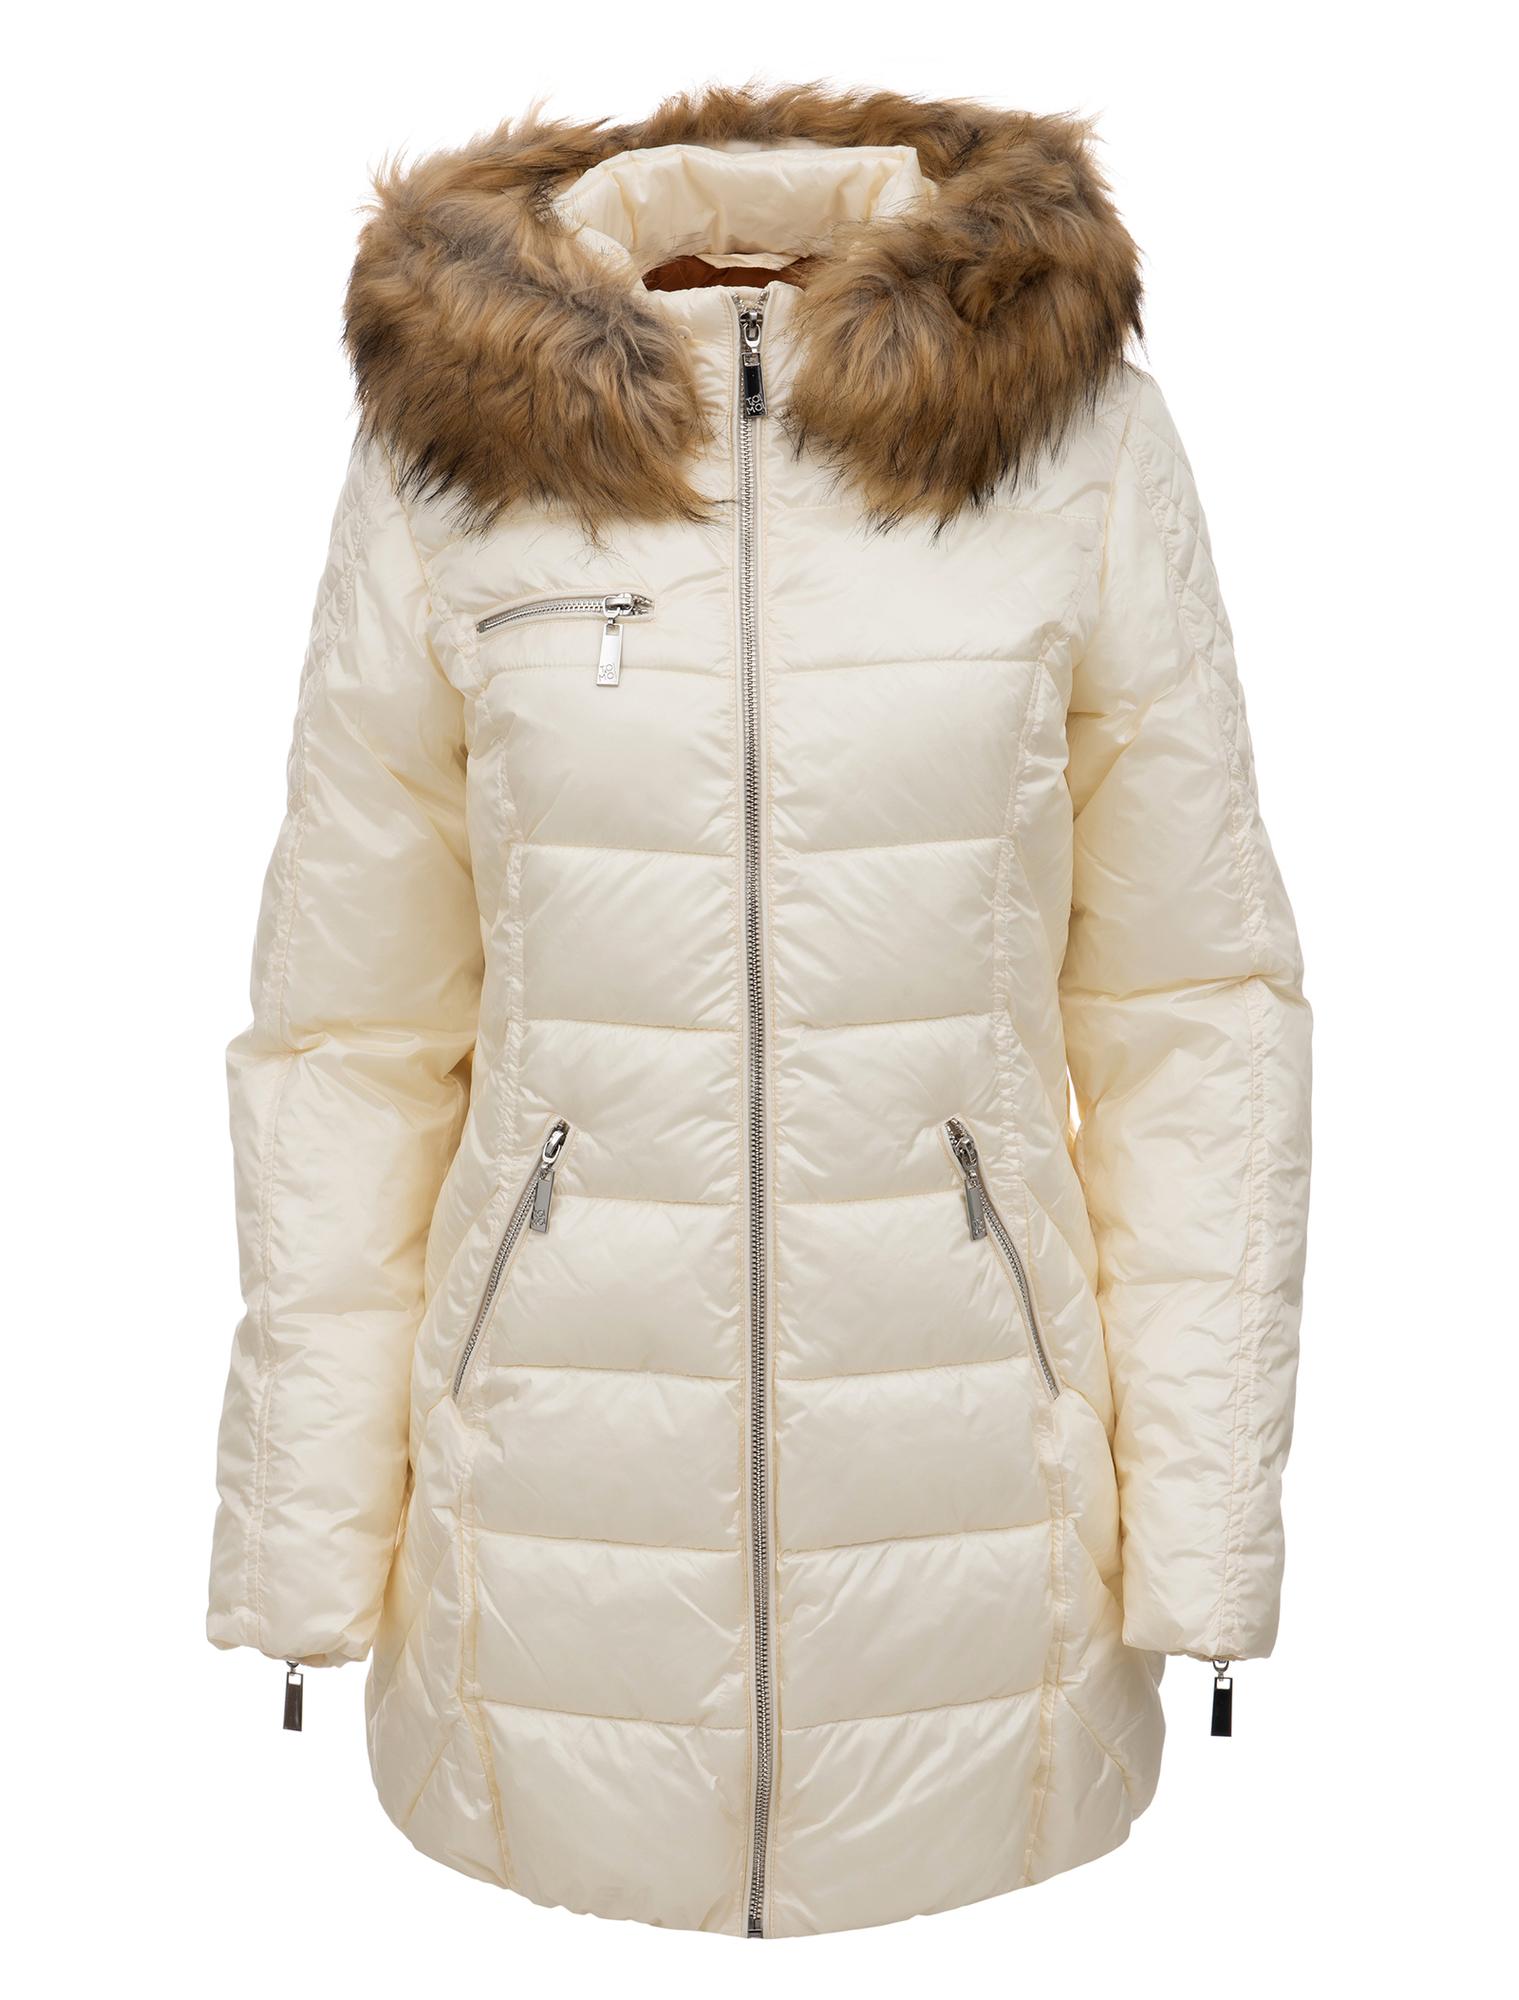 Puffer μπουφάν μακρύ με faux γούνινη κουκούλα - ΙΒΟΥΑΡ